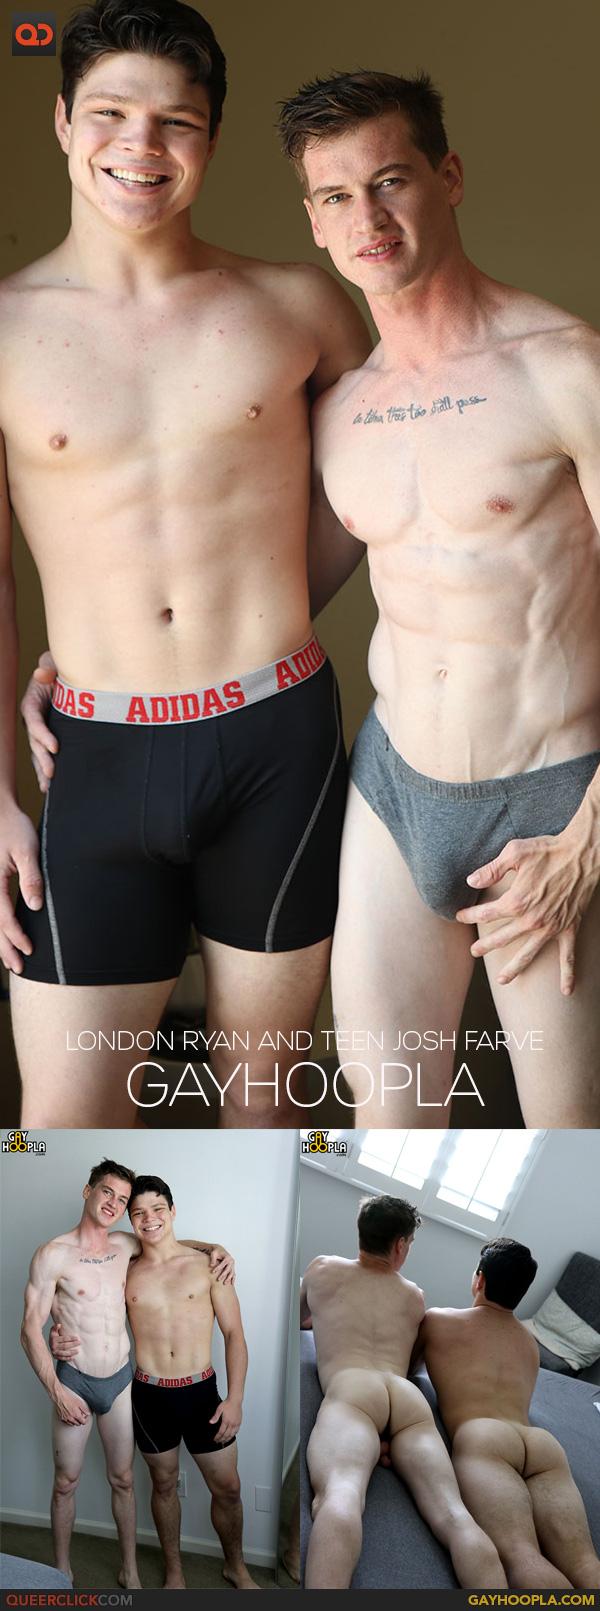 GayHoopla: London Ryan and Teen Josh Farve